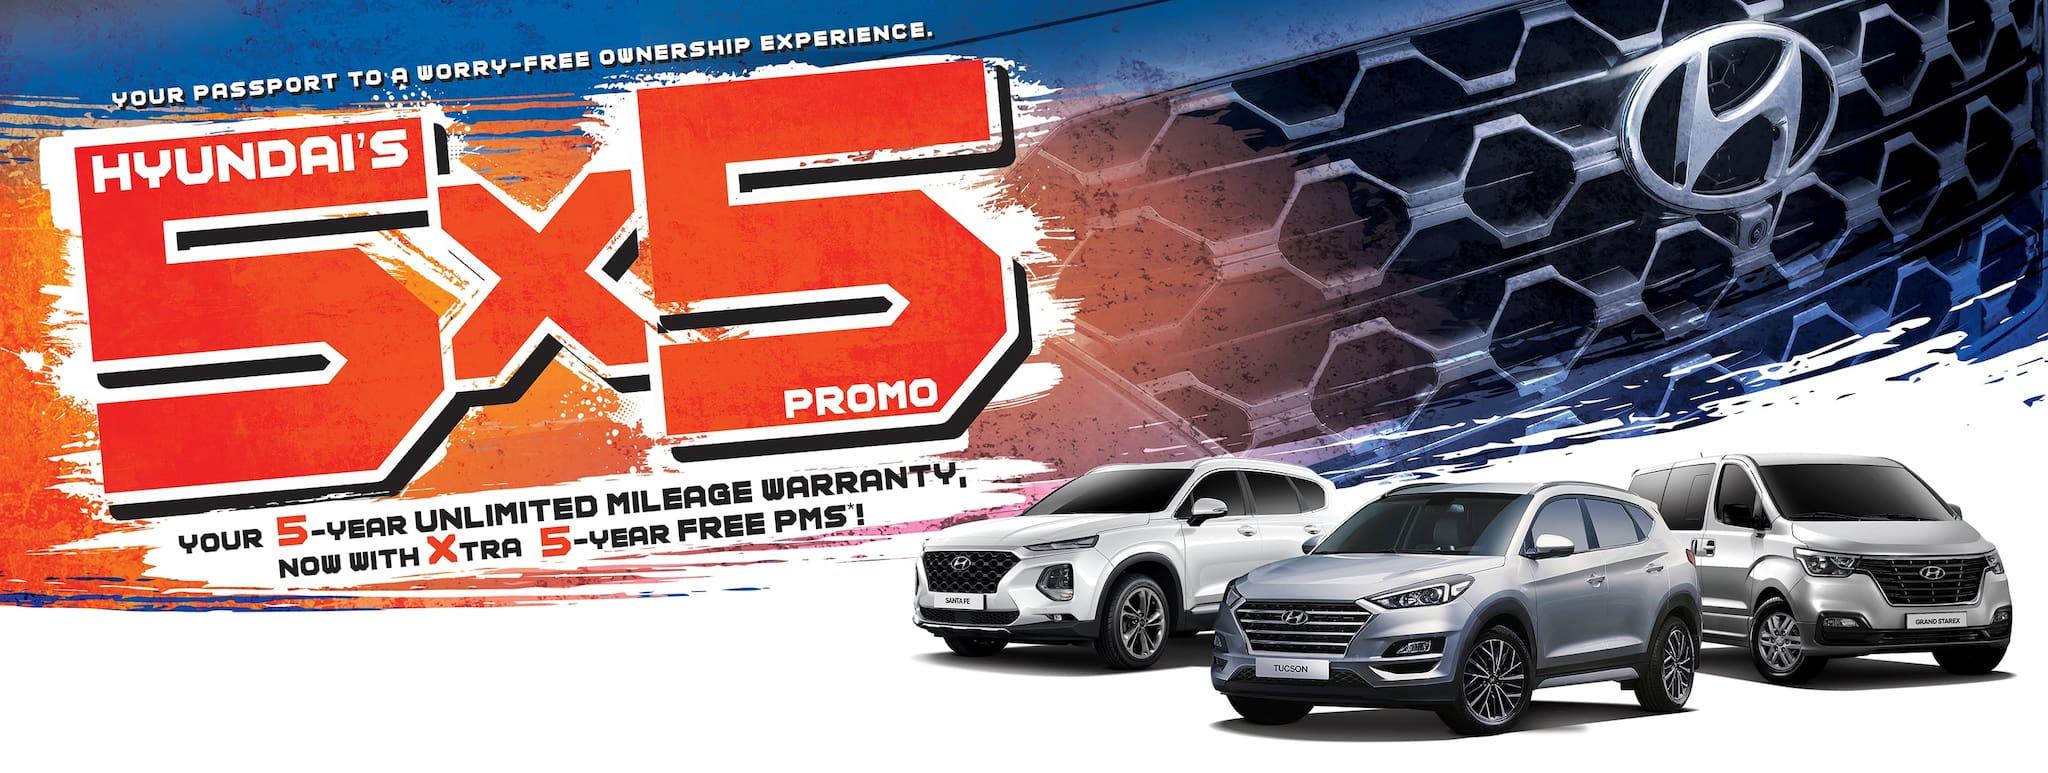 Keep Calm and Worry No More with Hyundai's 5x5 Promo